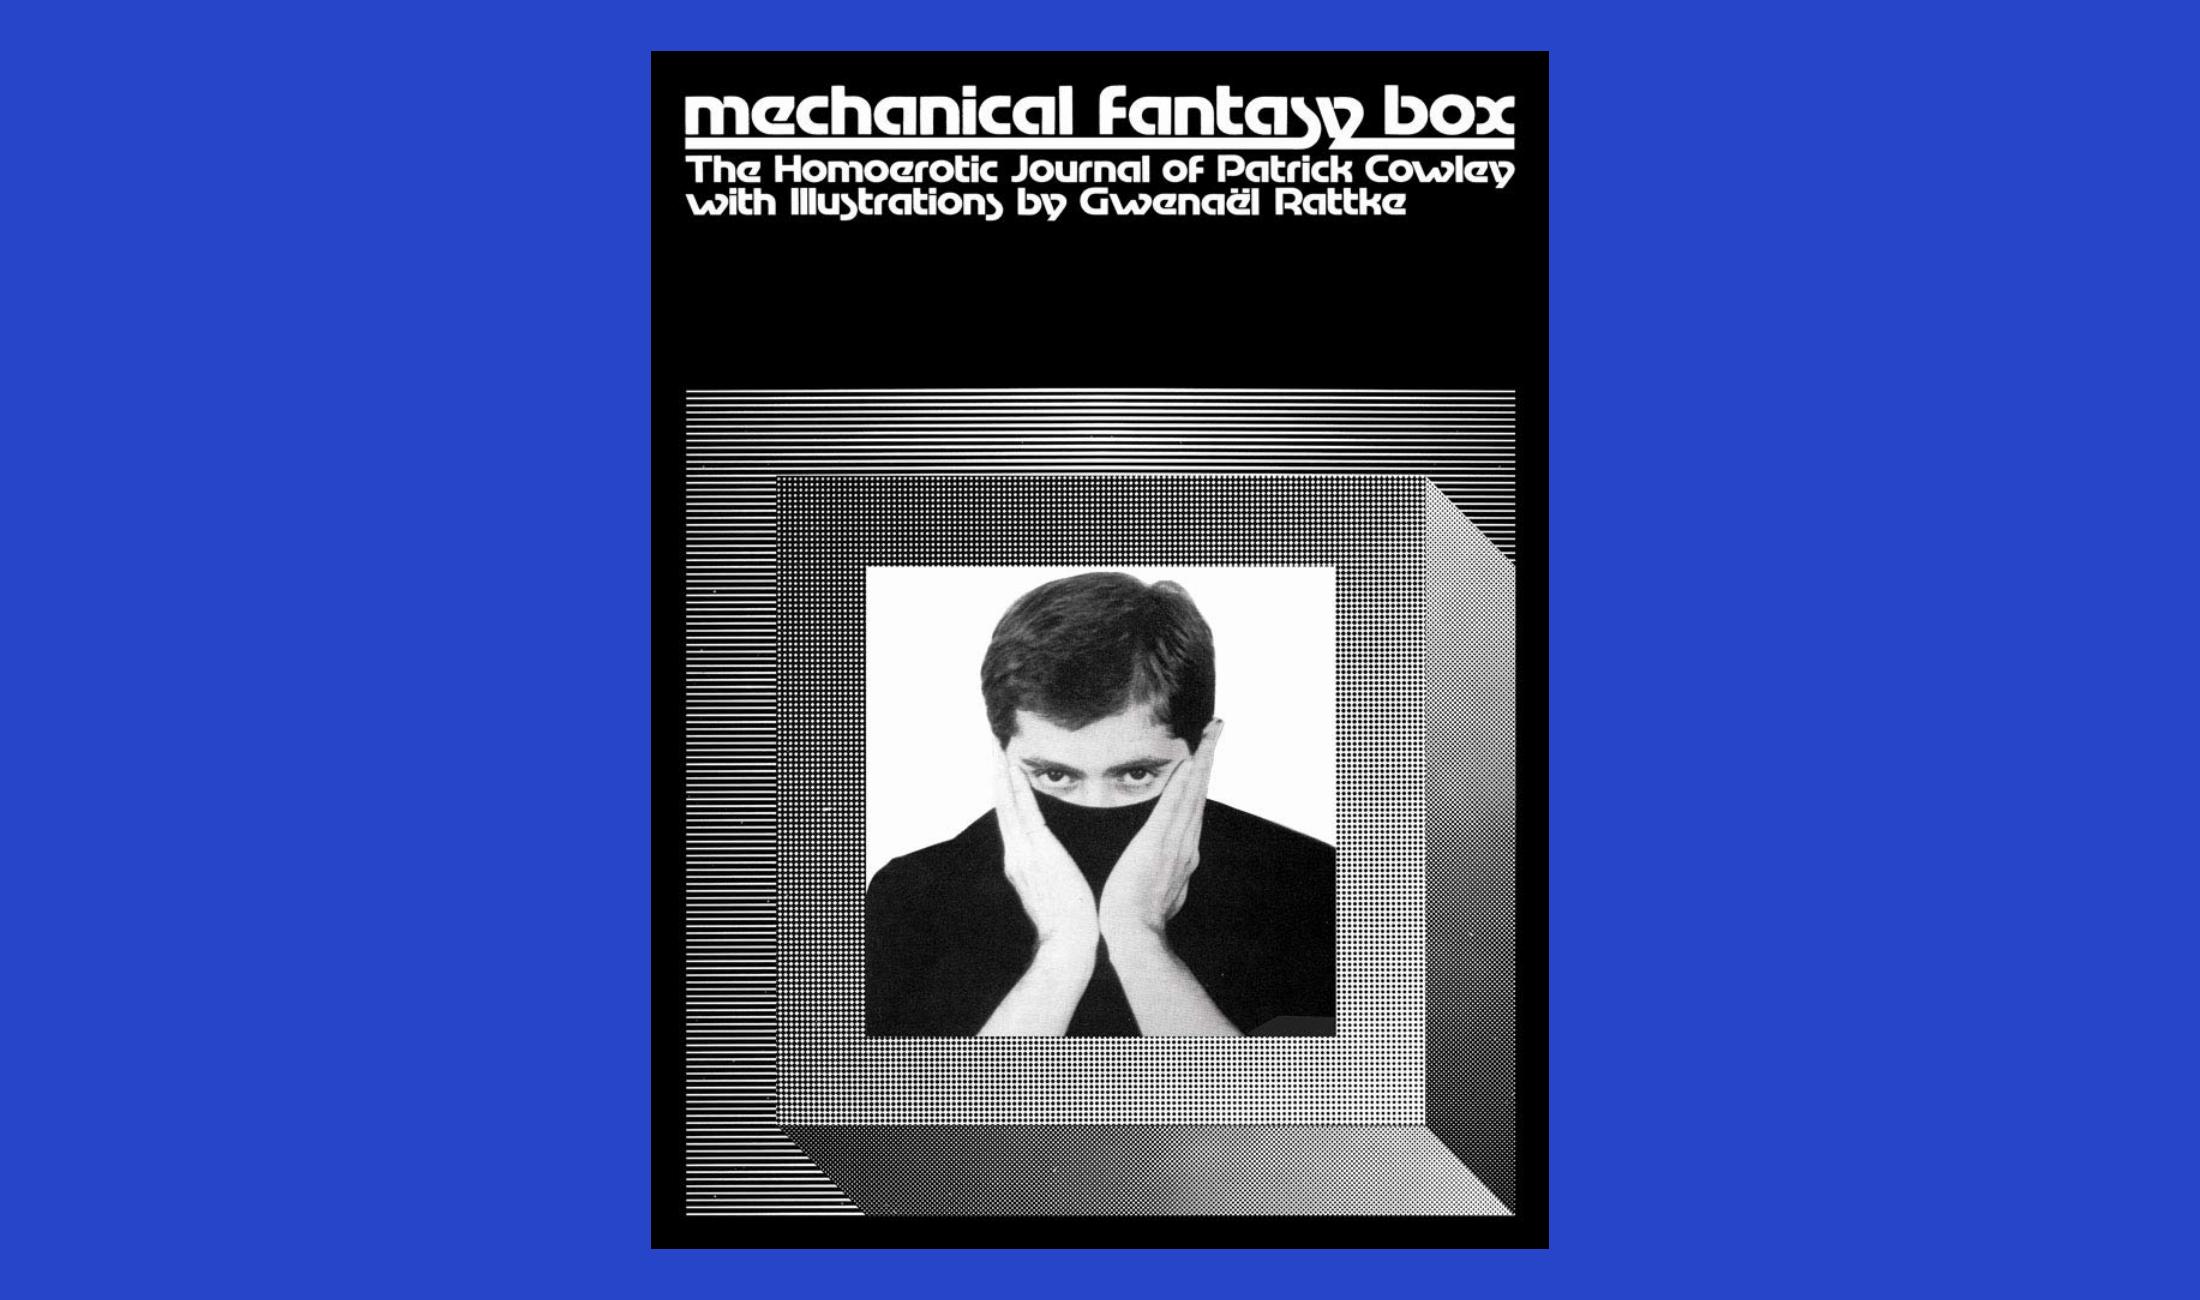 Techno Autobiographie: Mechanical Fantasy Box von Patrick Cowley